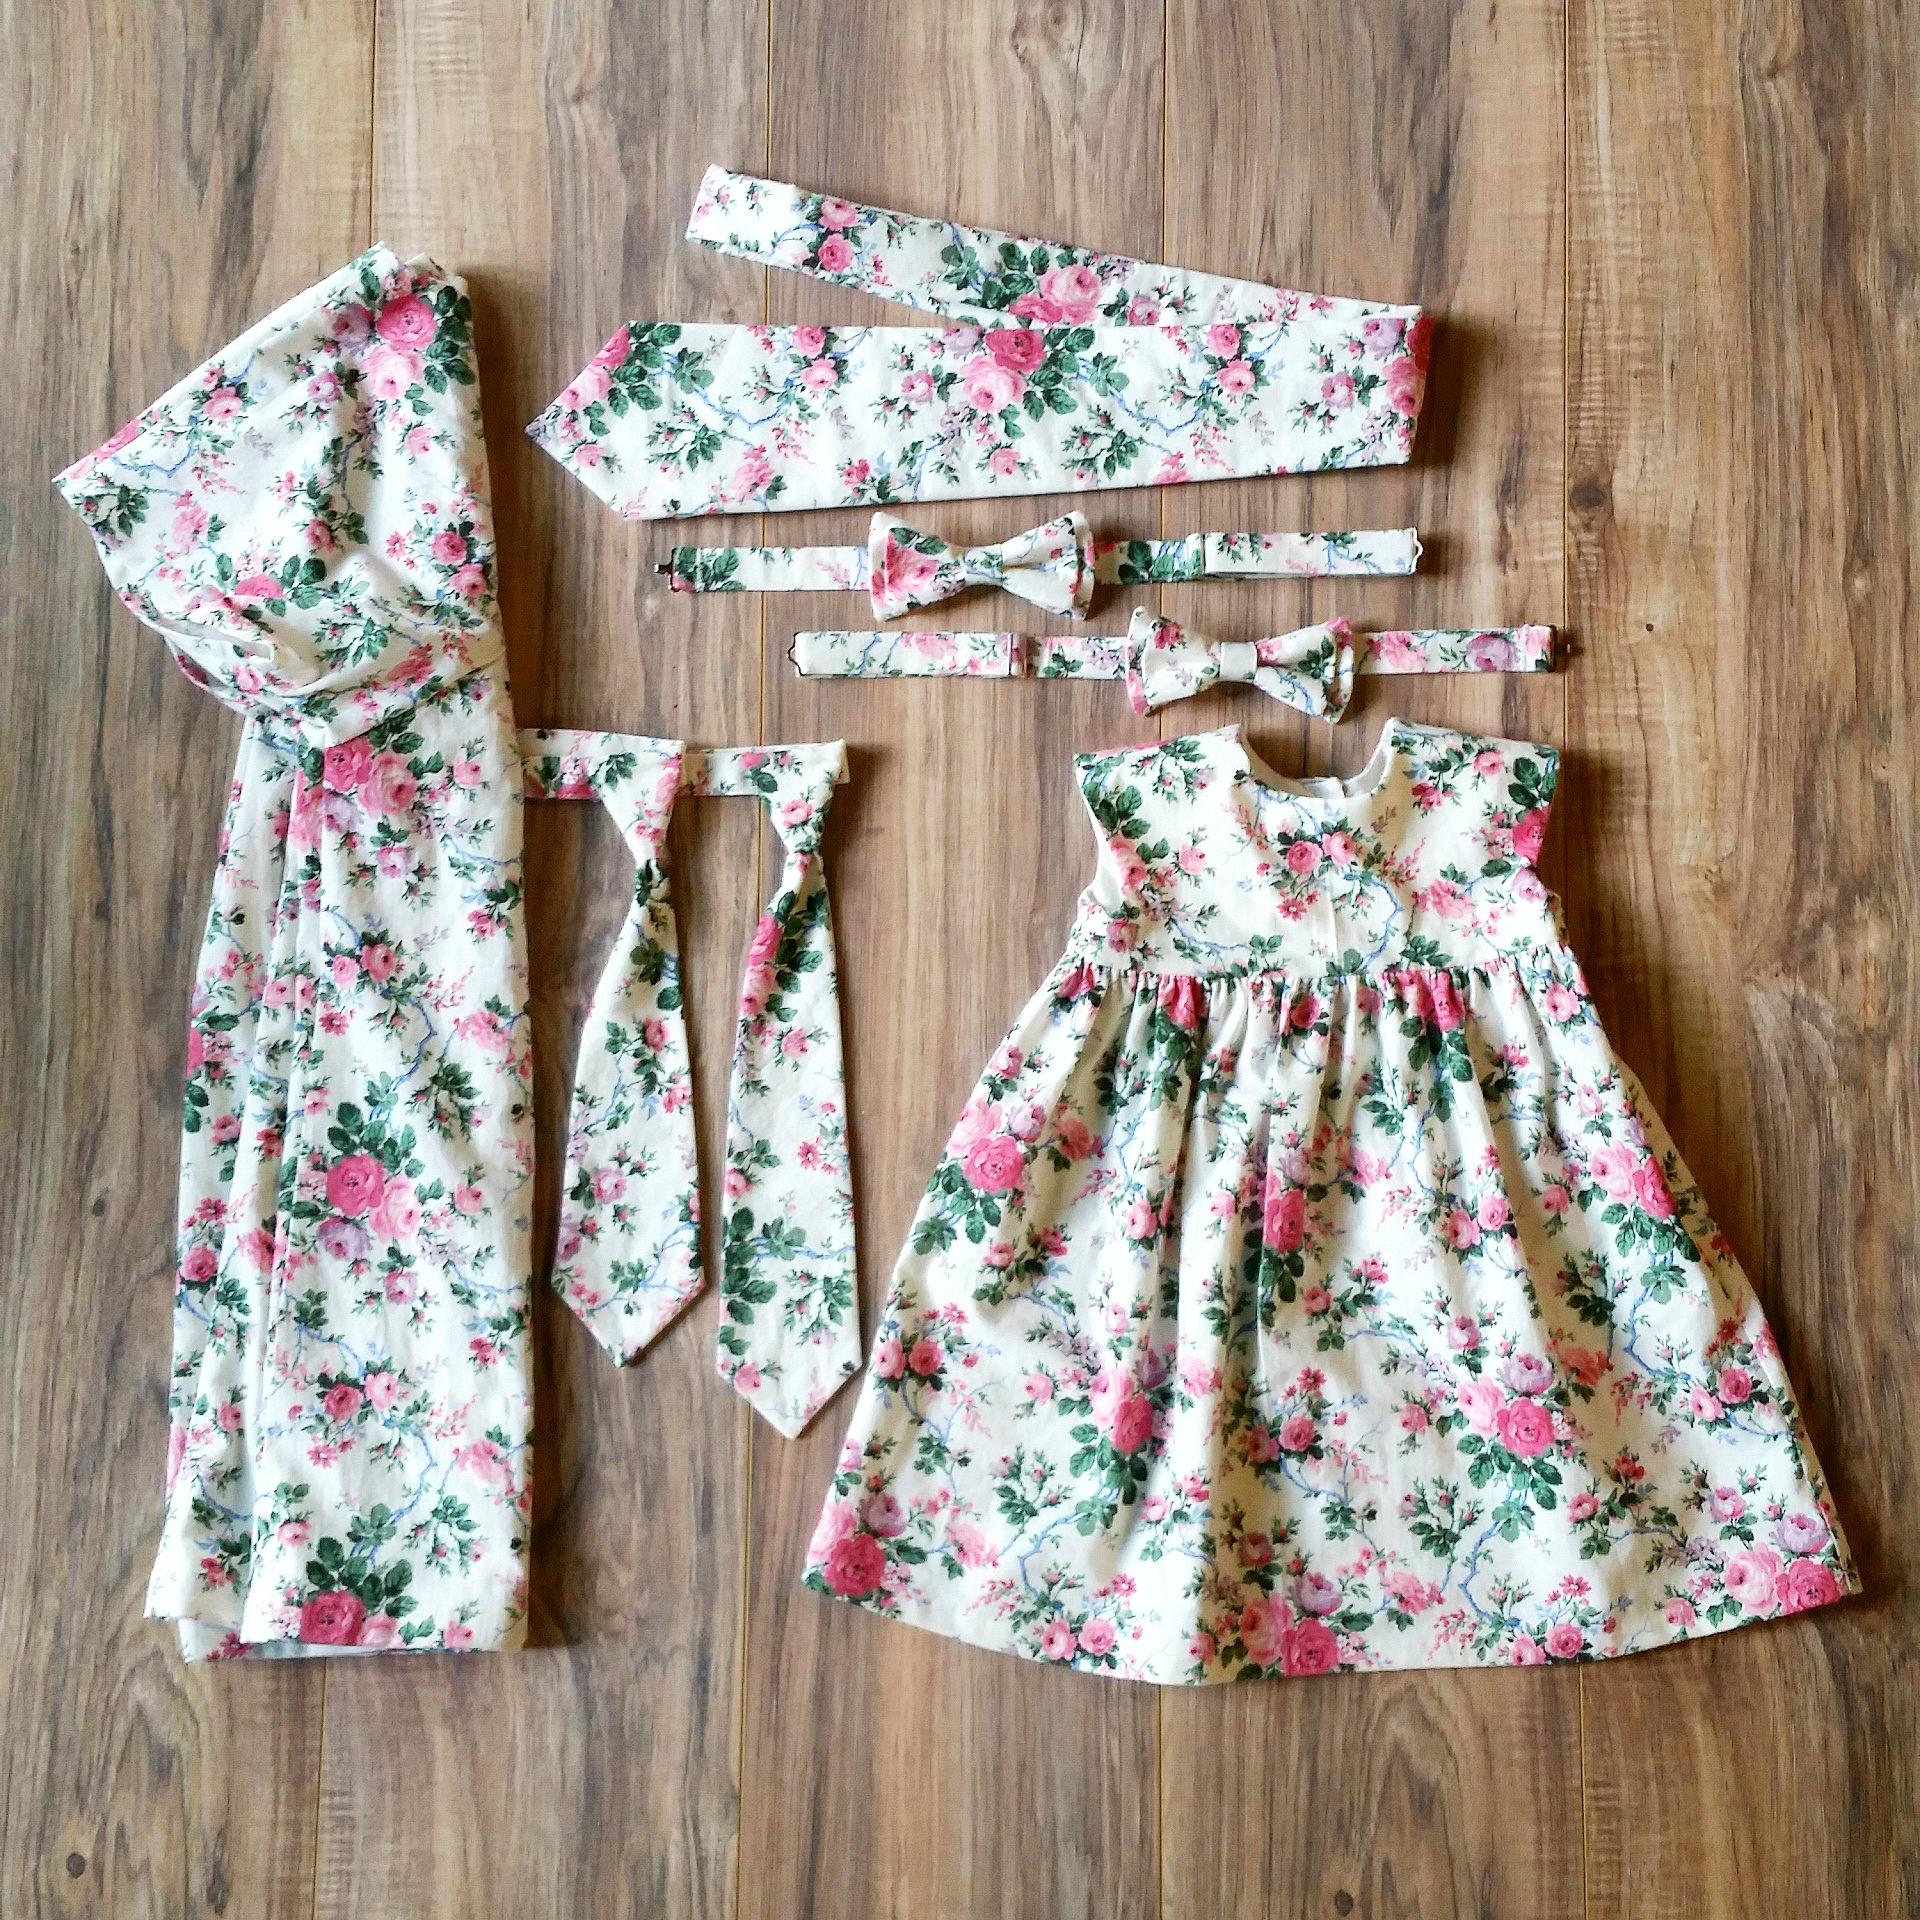 Rose Blouse, Ties, and Dress.jpg